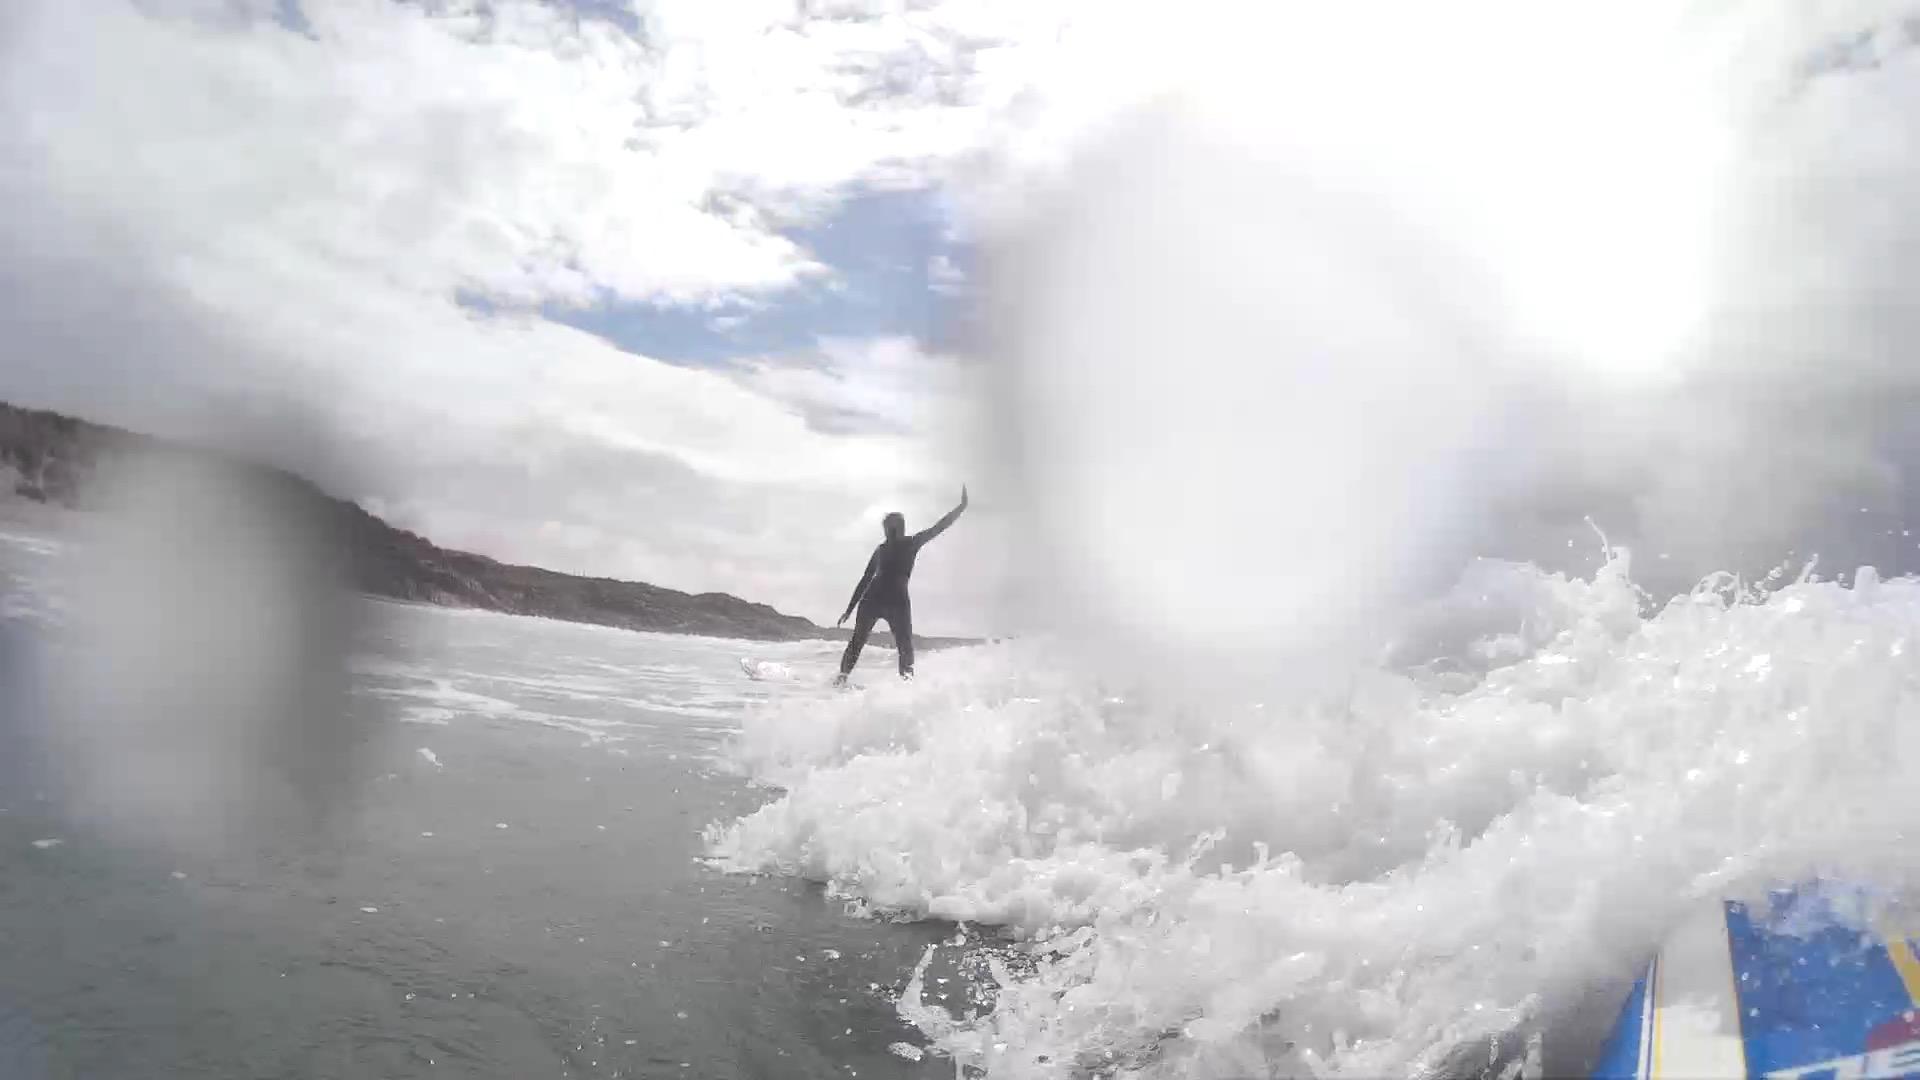 siwei-surfing-skyscanner-inspiration-lounge-1